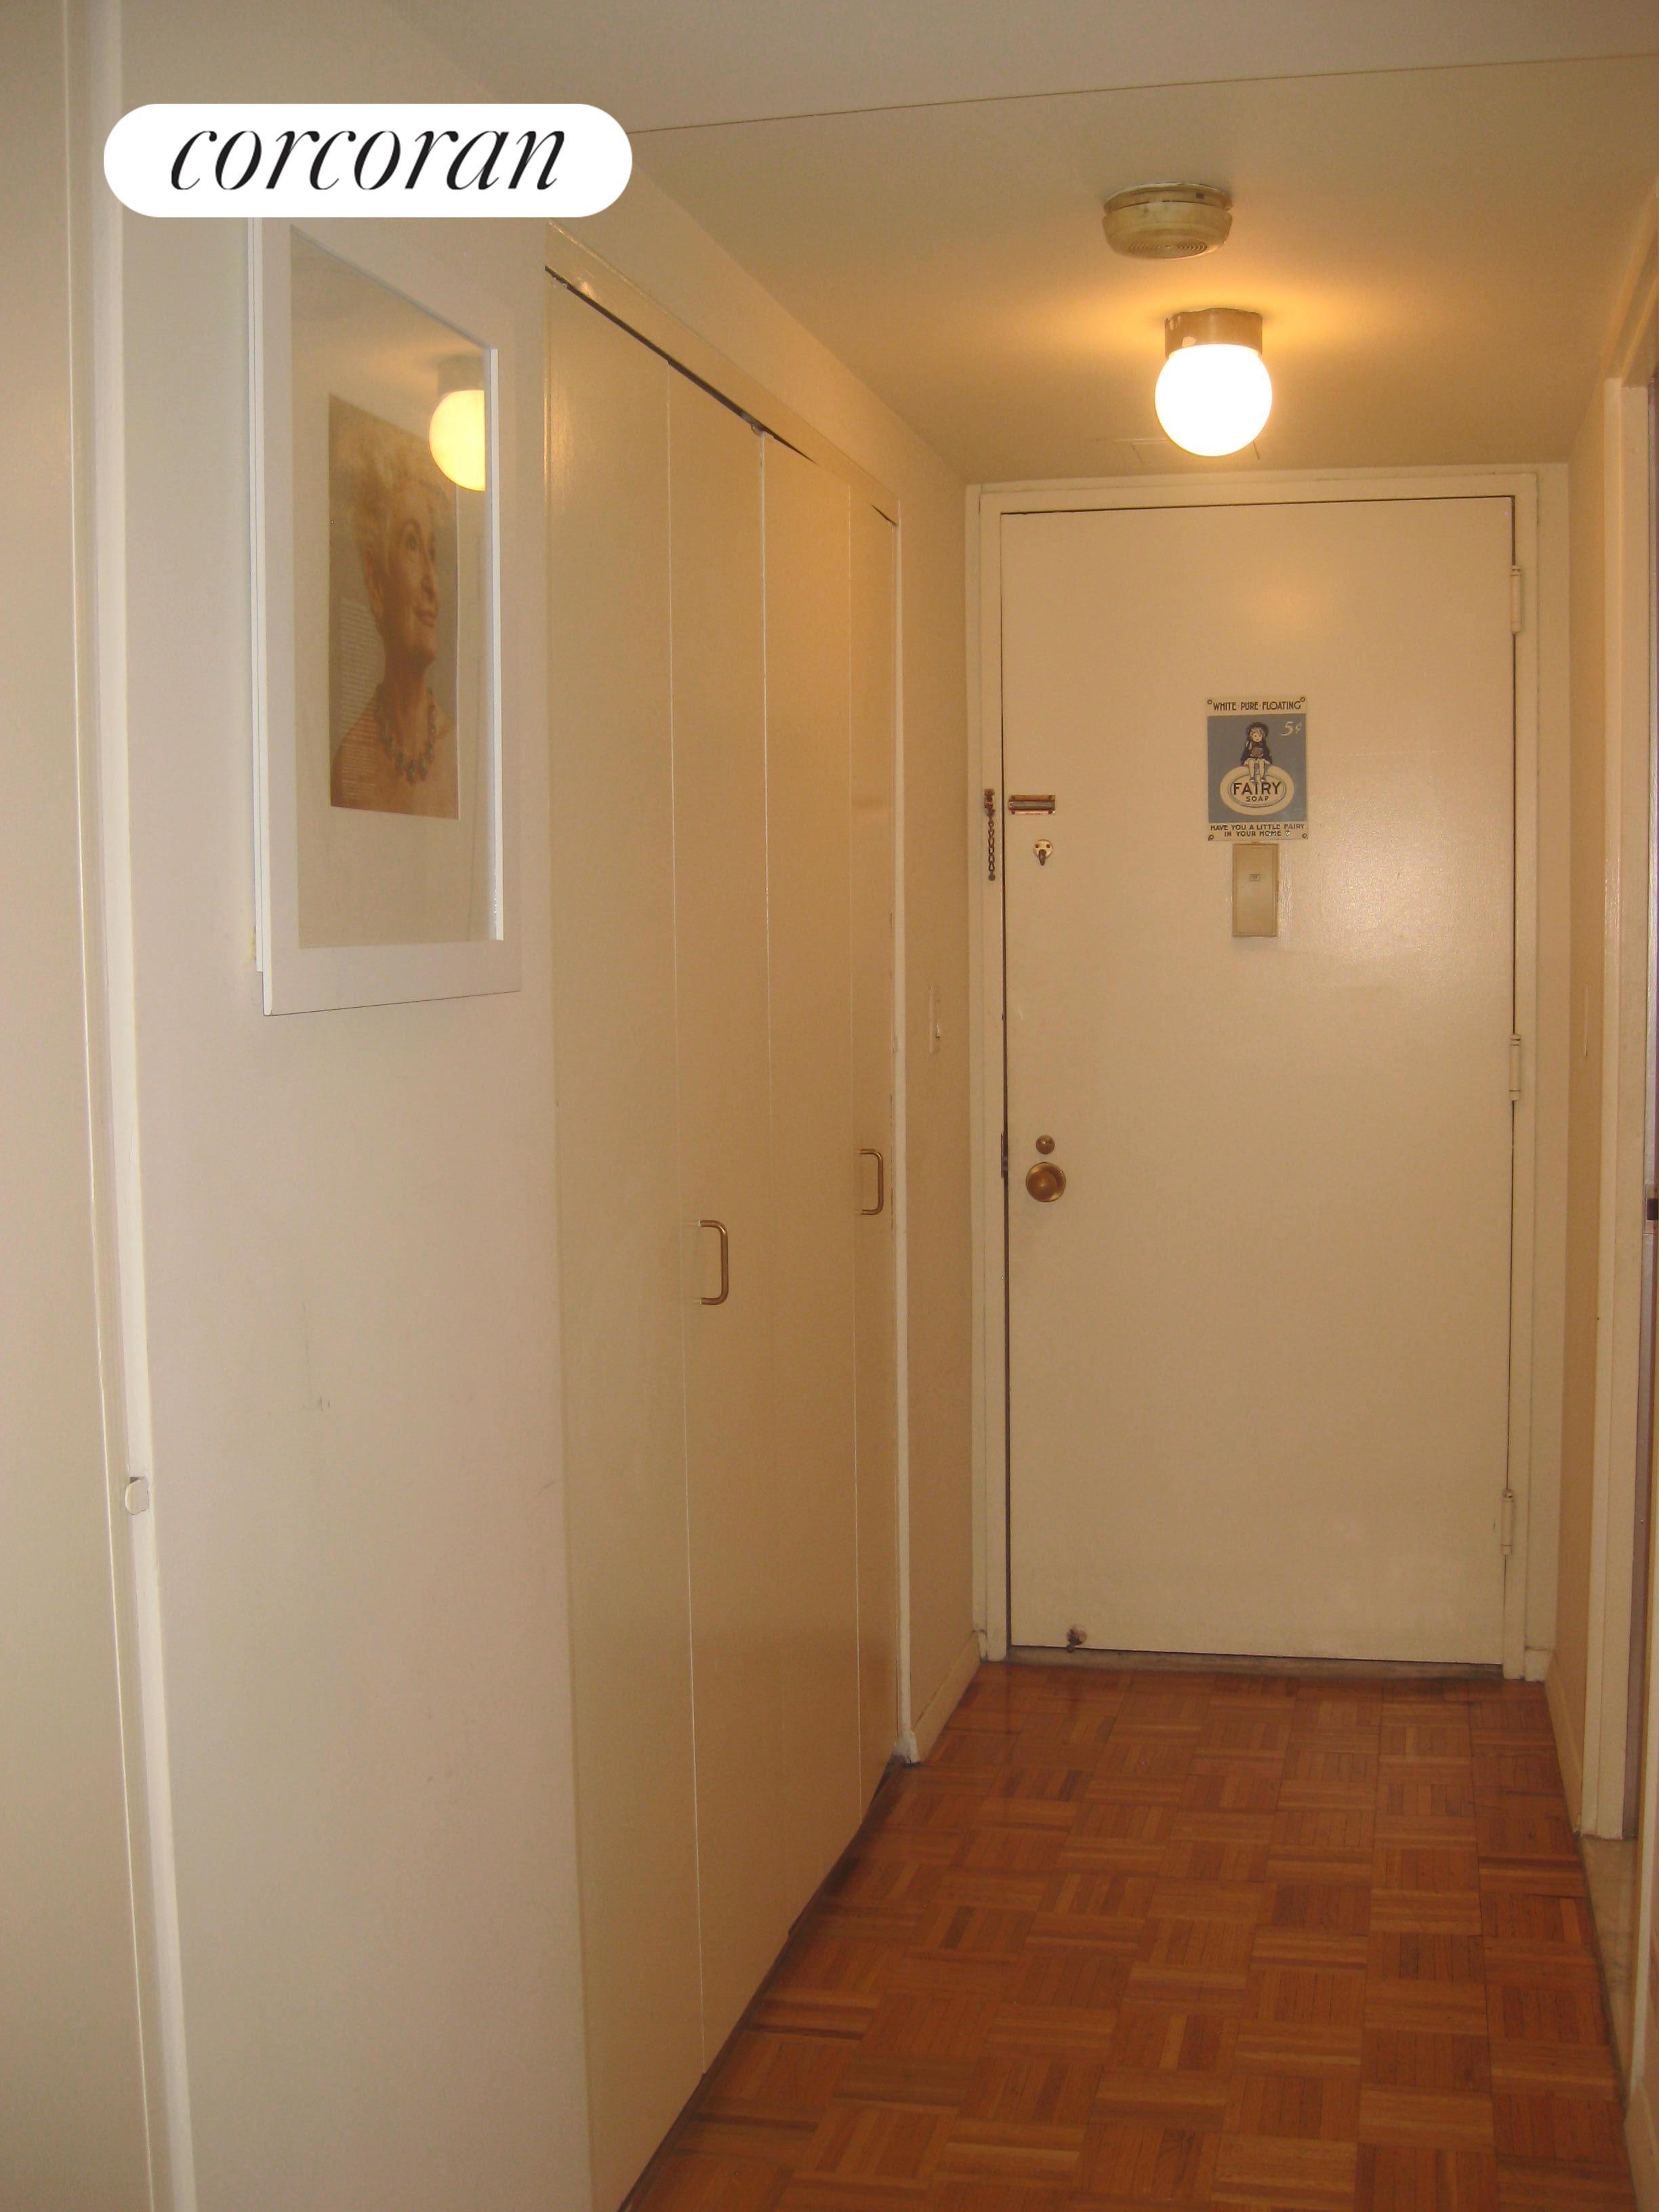 Corcoran 393 West 49th Street Apt 5kk Clinton Rentals